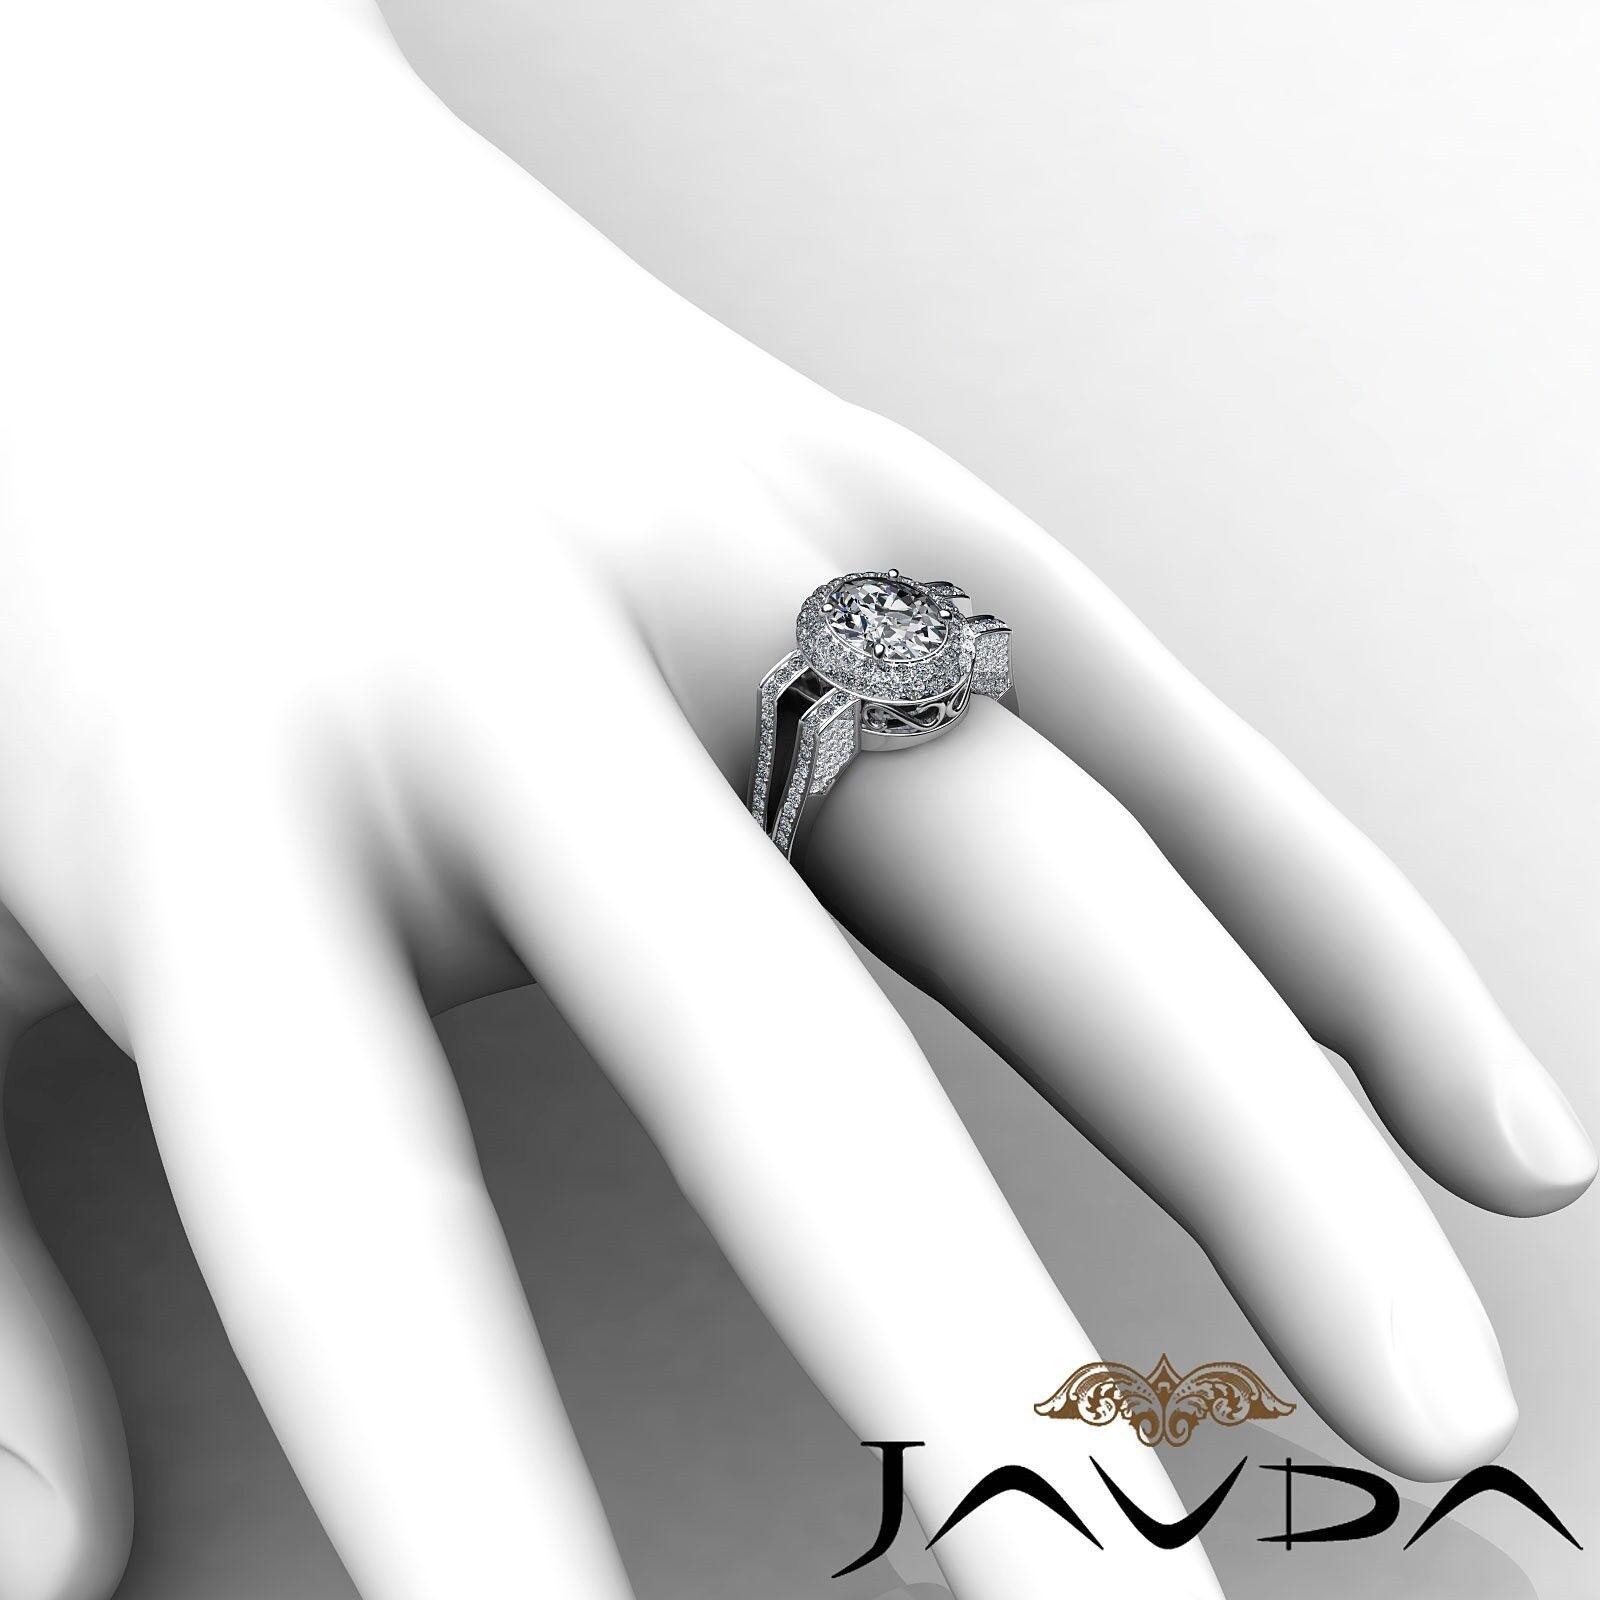 1.9ctw Gala Halo Split Shank Oval Diamond Engagement Ring GIA E-VS2 White Gold 5